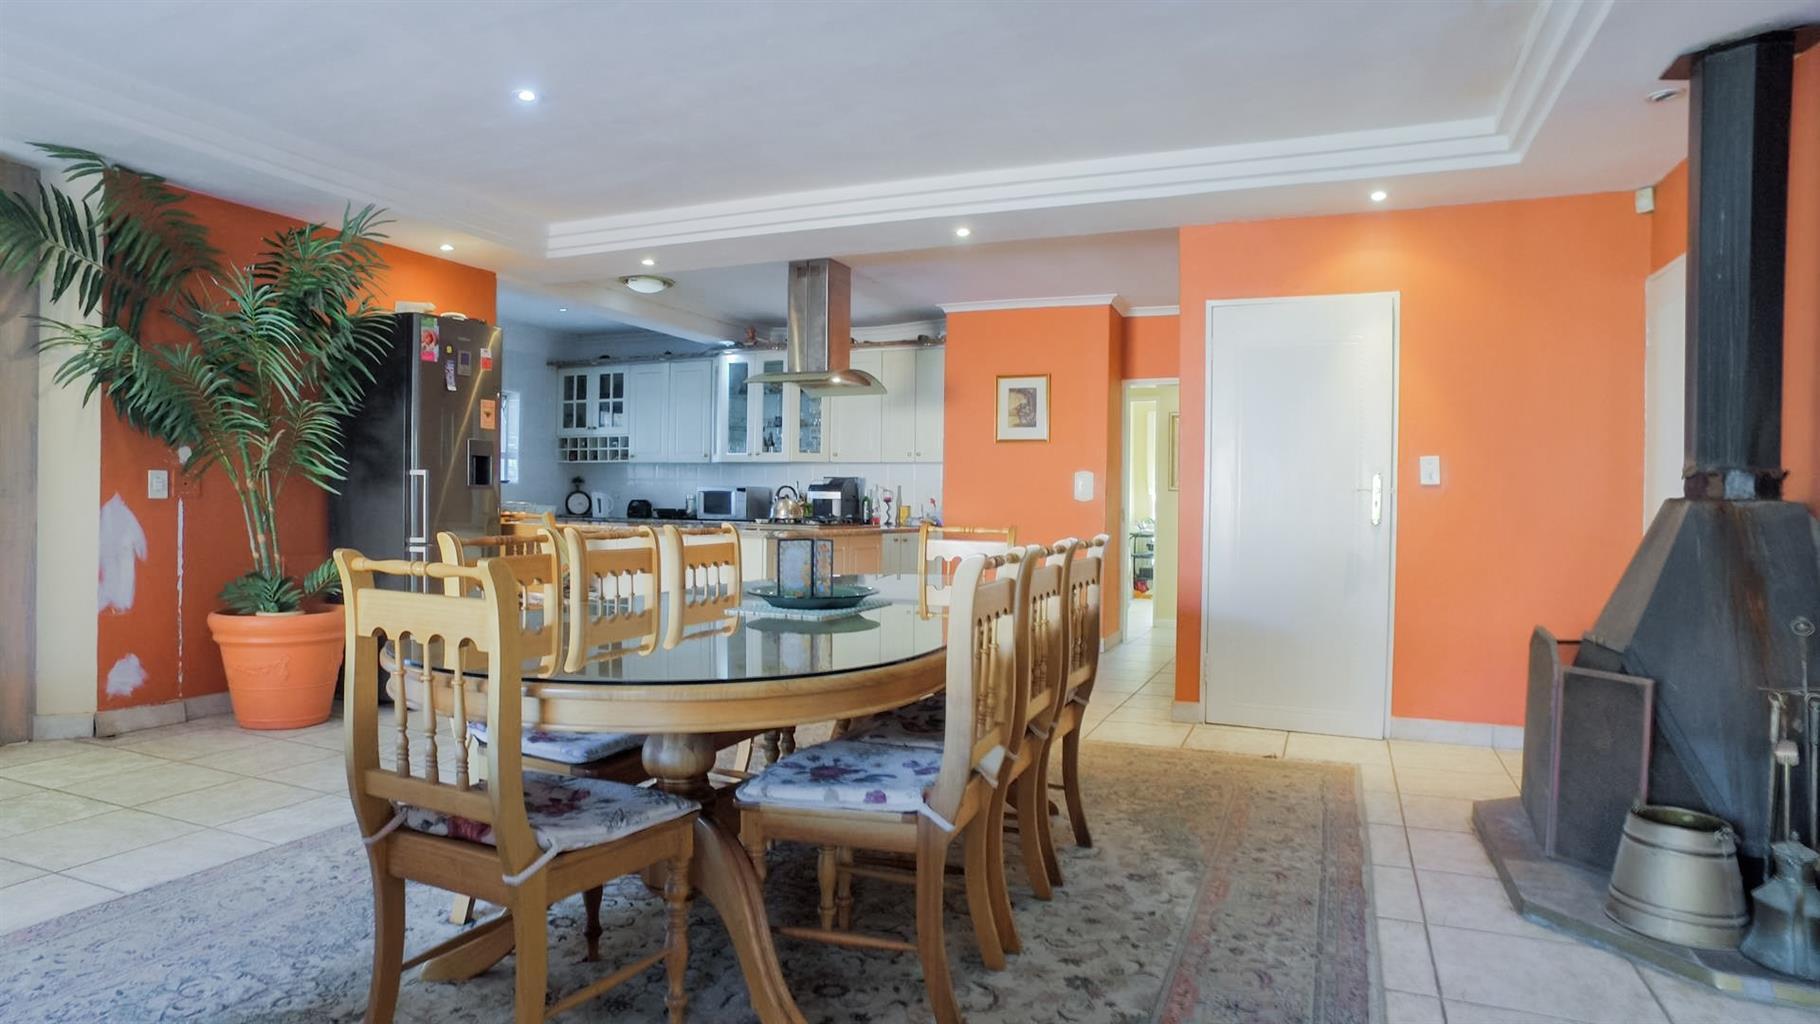 9 Bedroom house in Loevenstein Cape Town